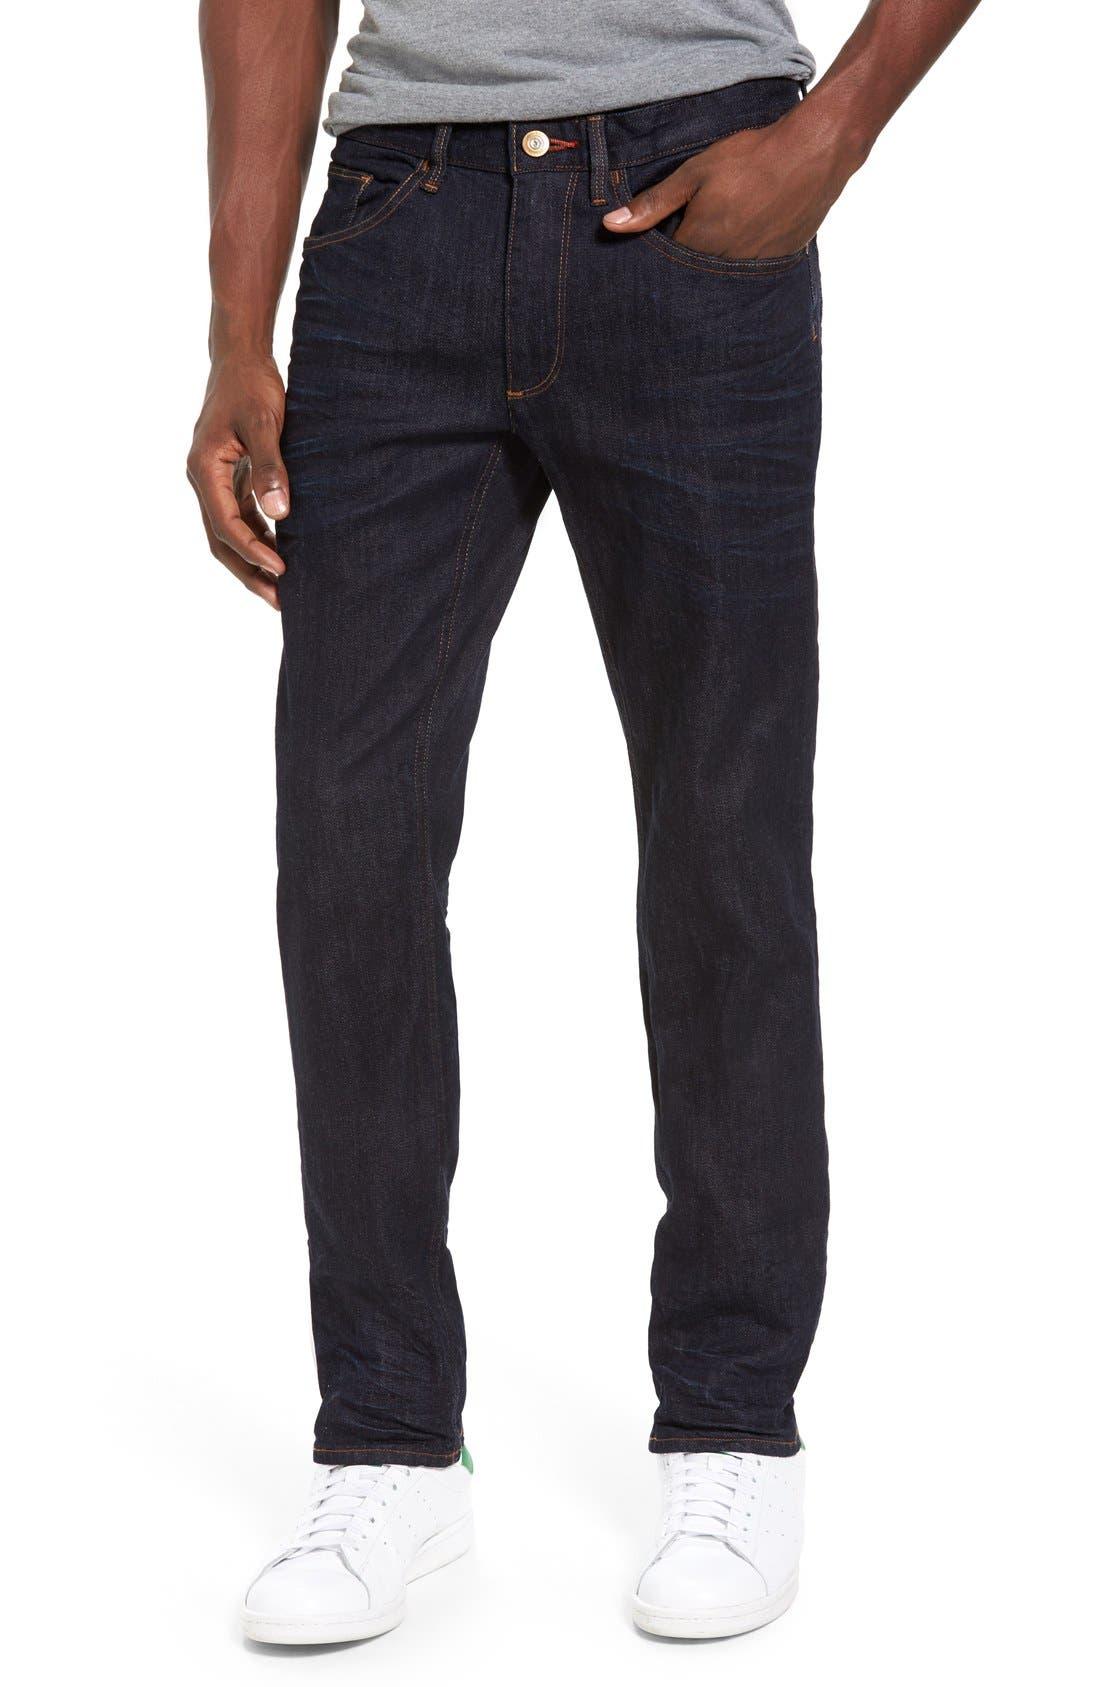 Canal Slim Fit Jeans,                             Alternate thumbnail 9, color,                             460